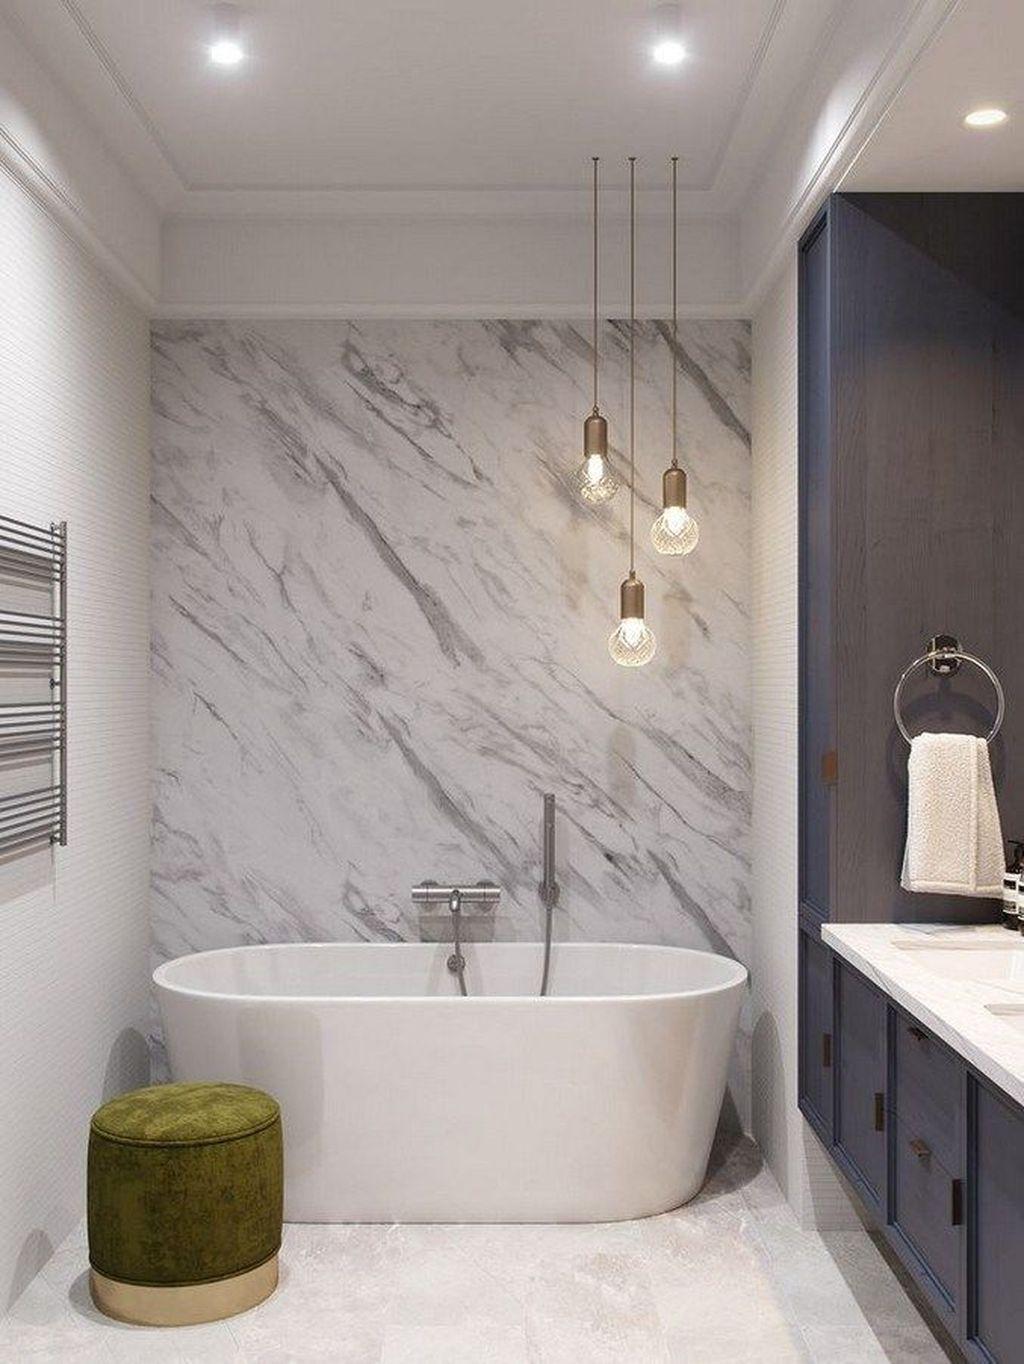 Fabulous Minimalist Bathroom Decor Ideas That Become Everyones Dream 12